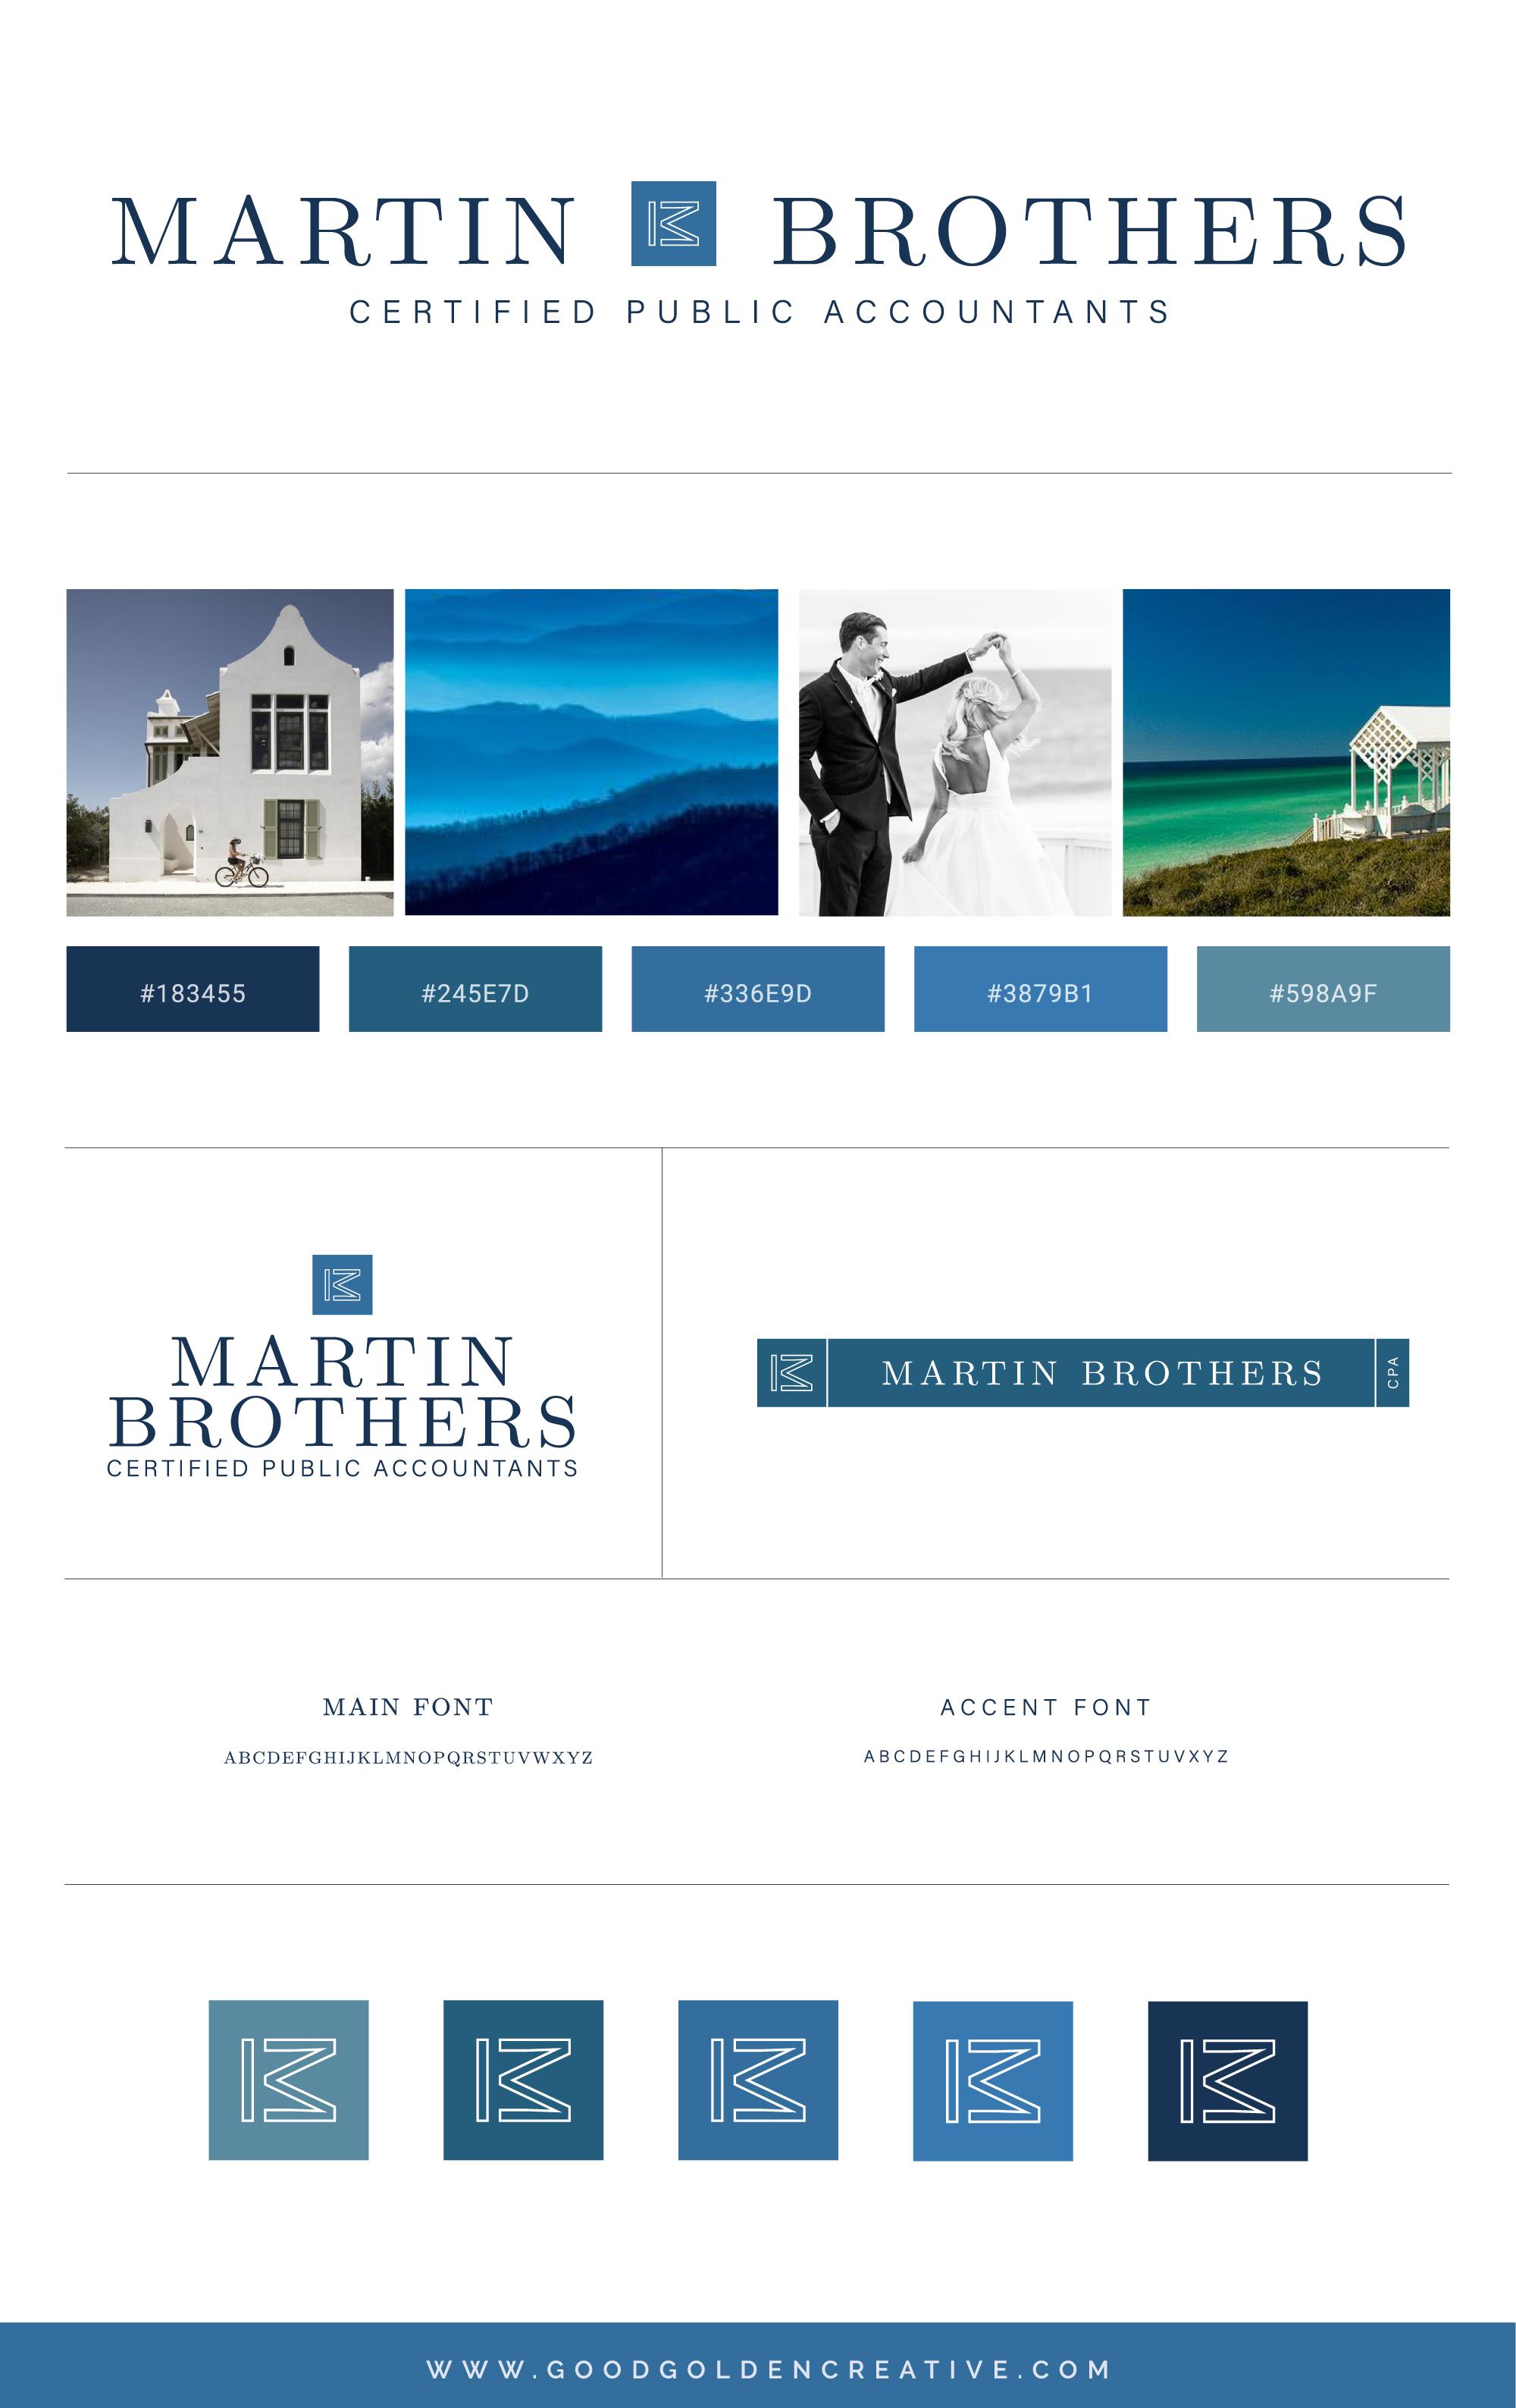 MartinBrothers_BrandBoard.jpg